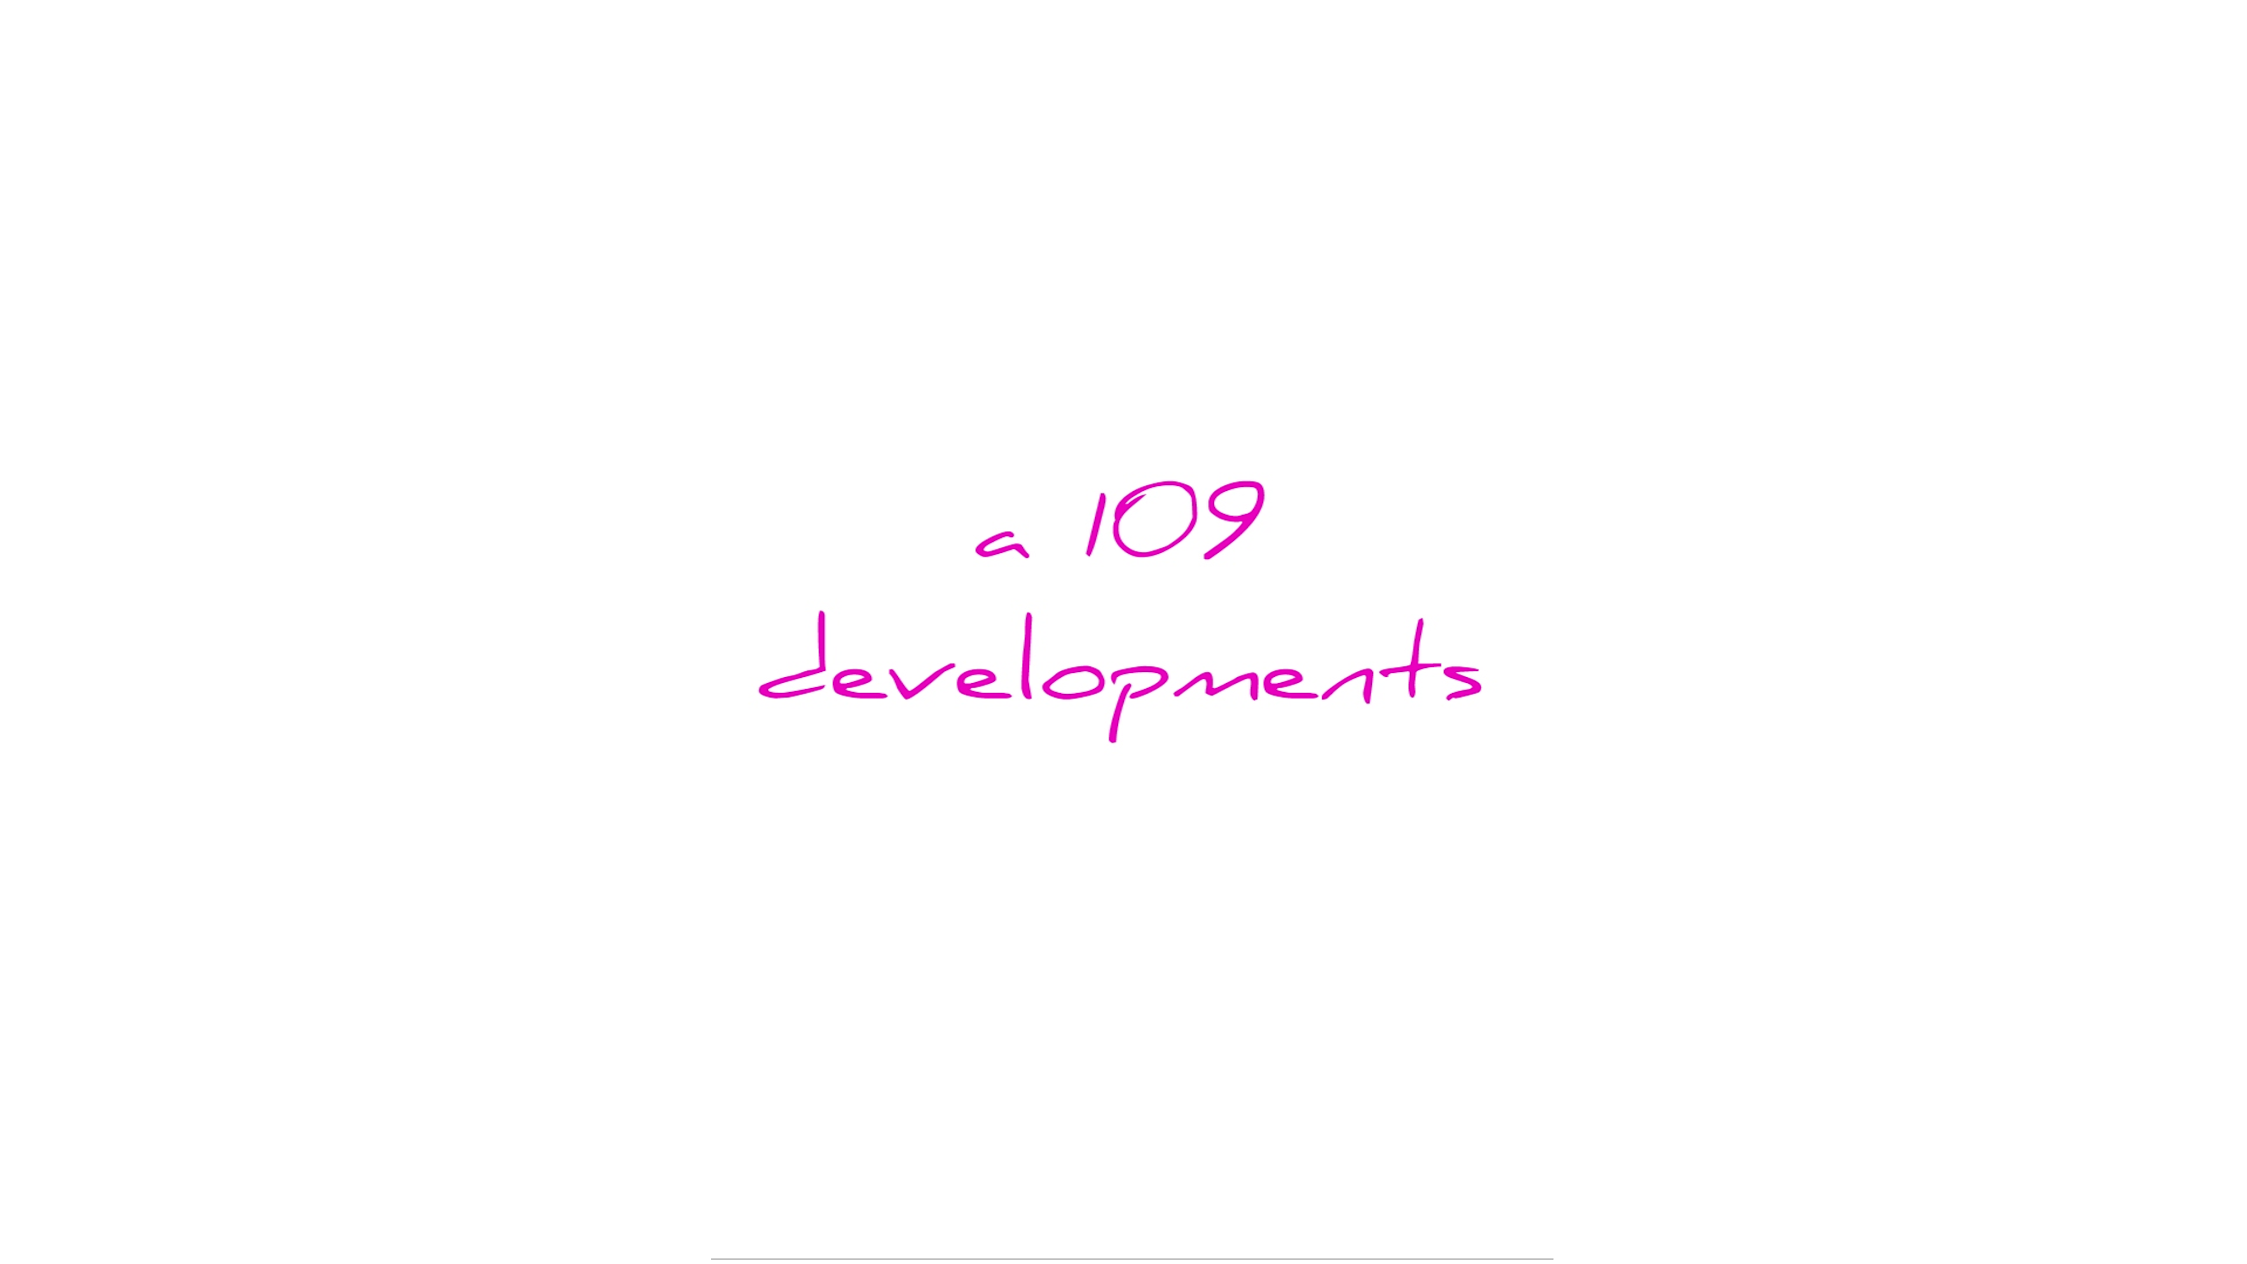 A 109 Developments